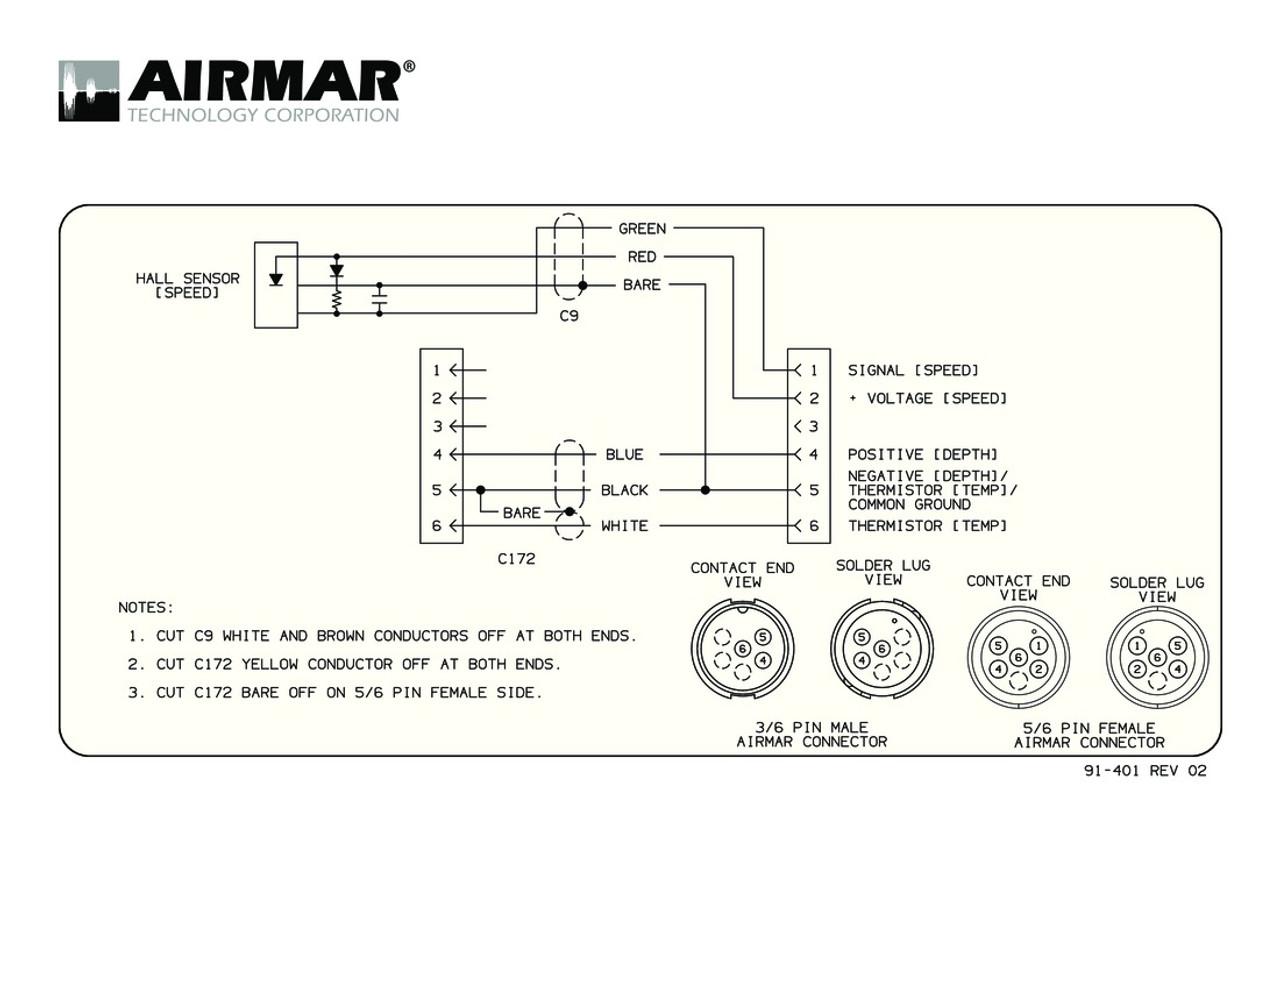 small resolution of airmar wiring diagram garmin 6 pin s blue bottle marine garmin transducer wiring diagram 4 pin